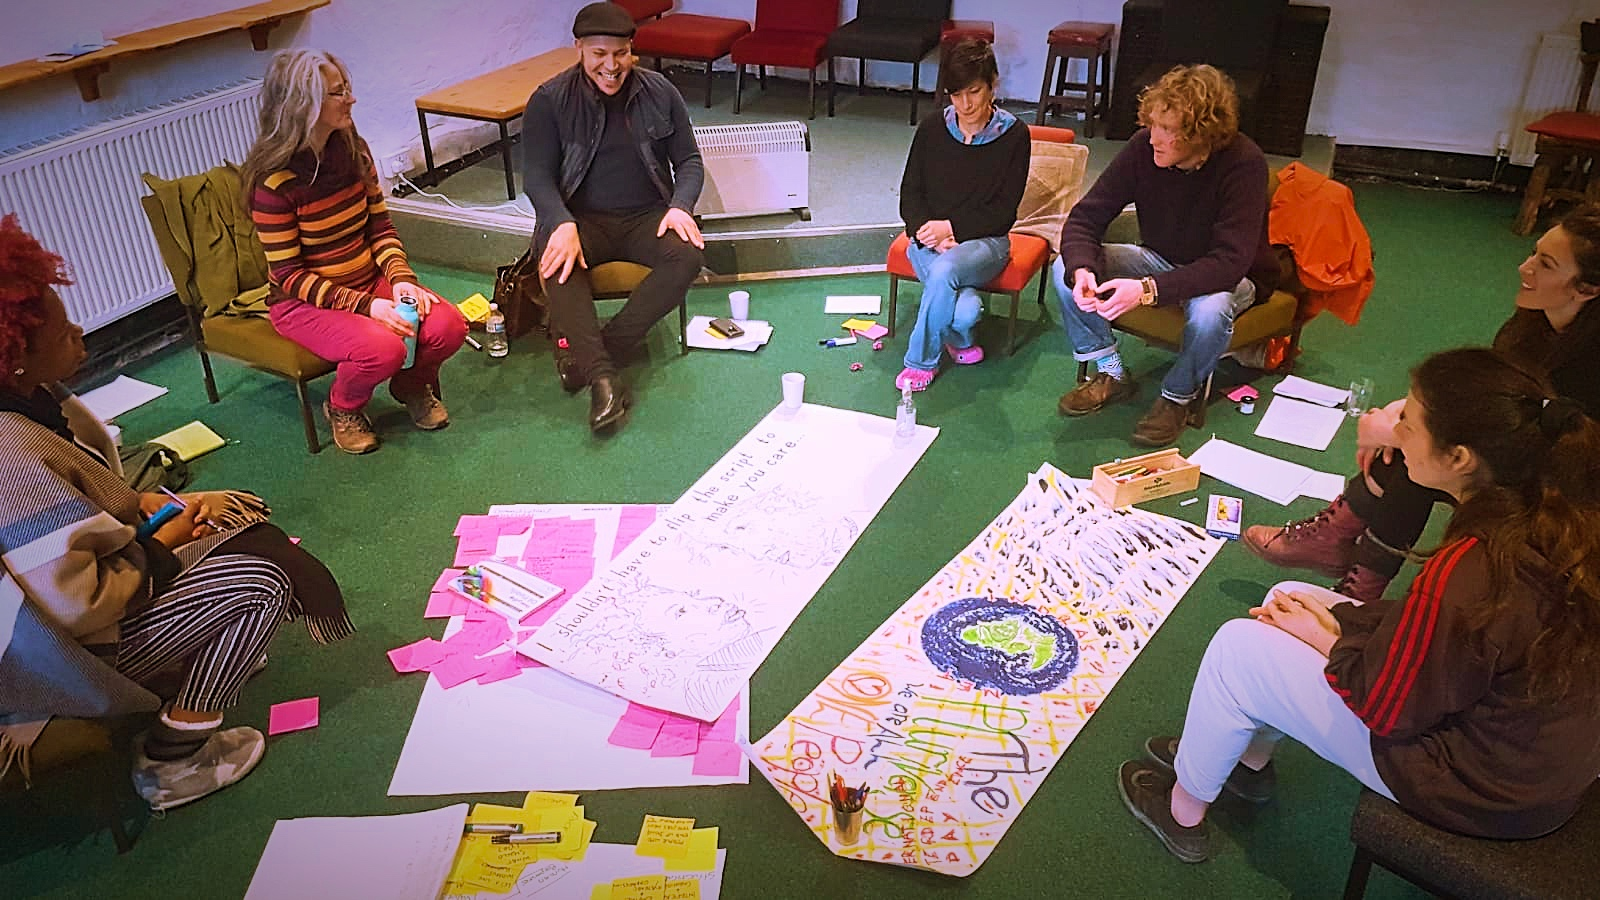 HeArts & Dreams Creative Learning